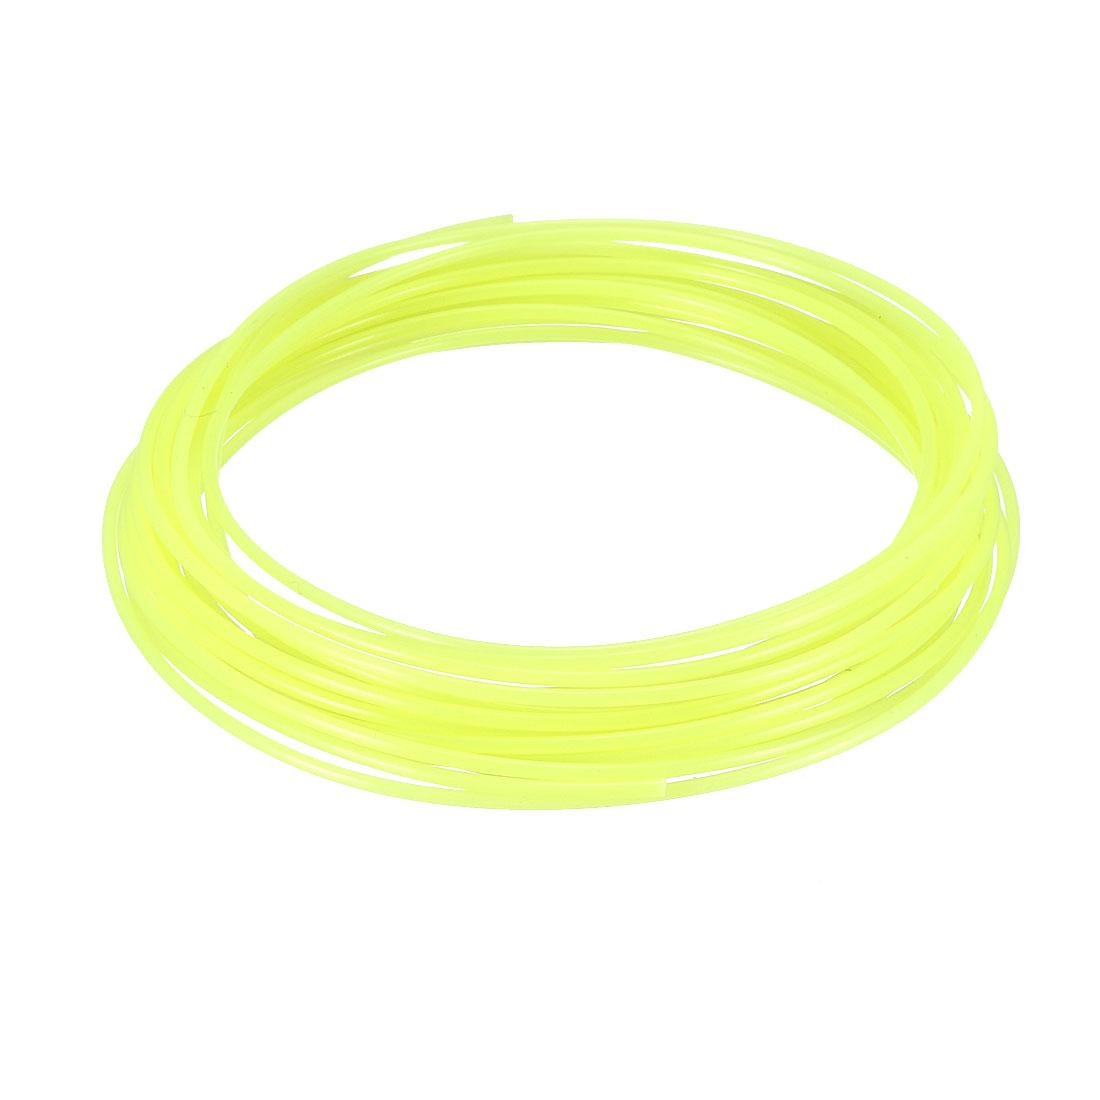 5 Meter/16 Ft PLA 3D Pen/3D Printer Filament, 1.75 mm Luminous Yellow